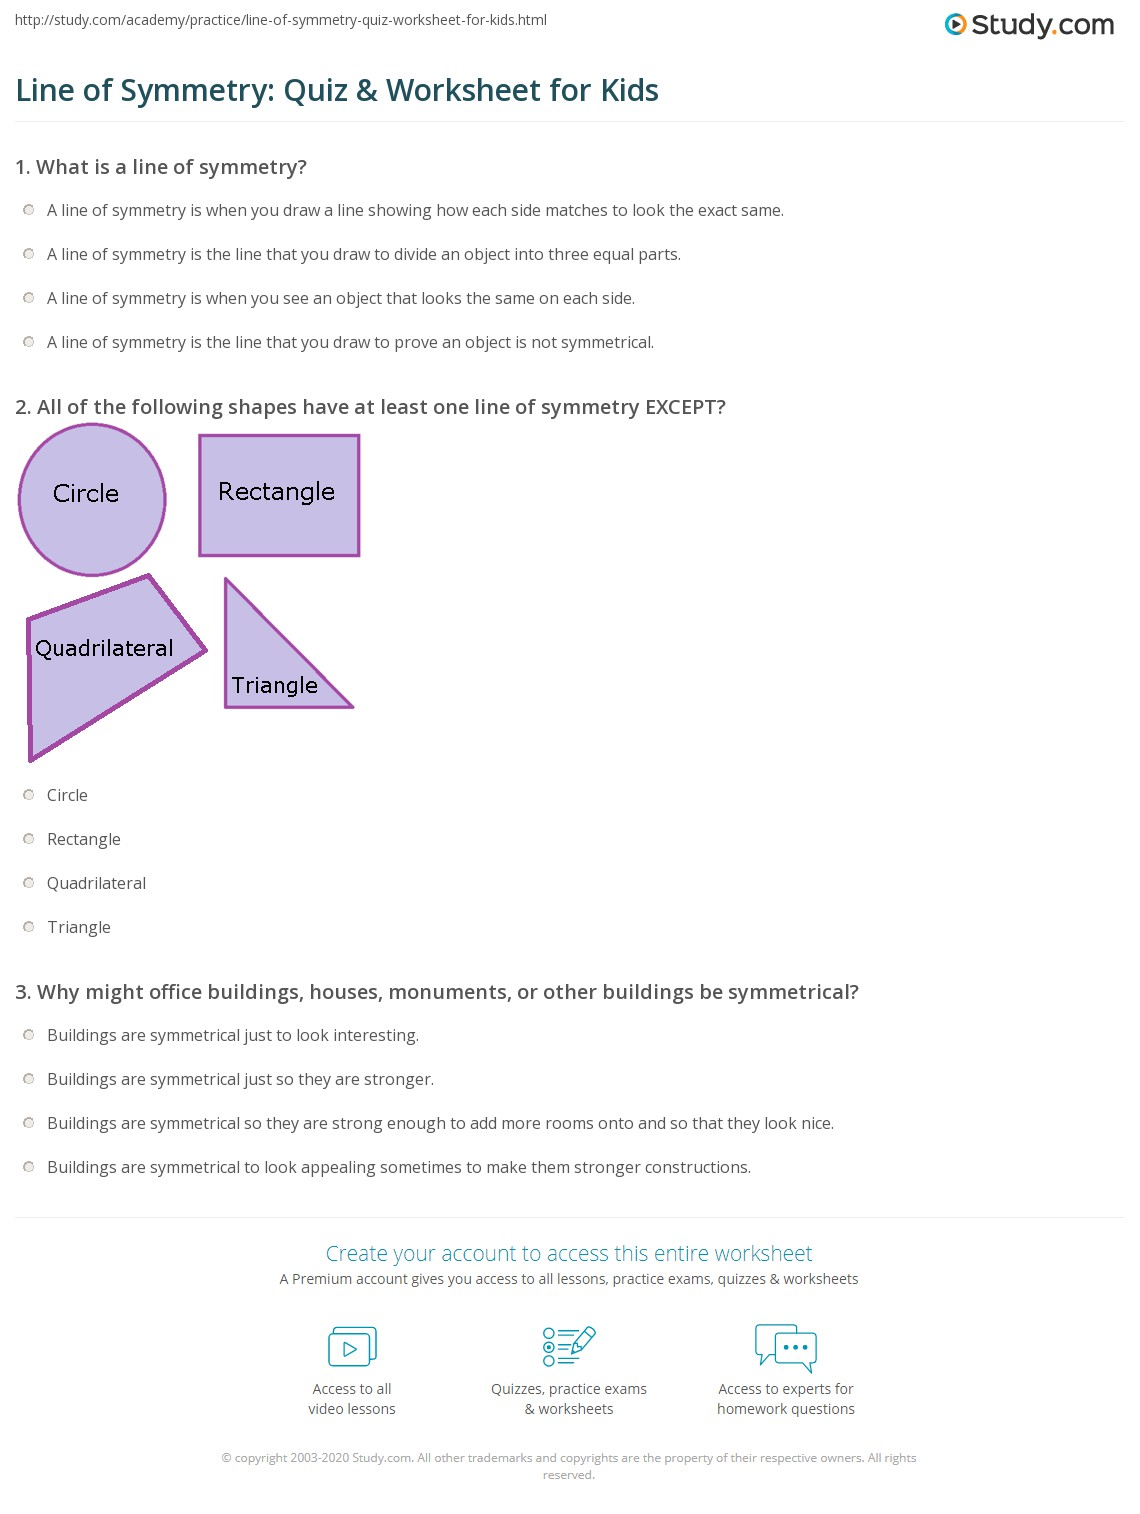 hight resolution of Line of Symmetry: Quiz \u0026 Worksheet for Kids   Study.com